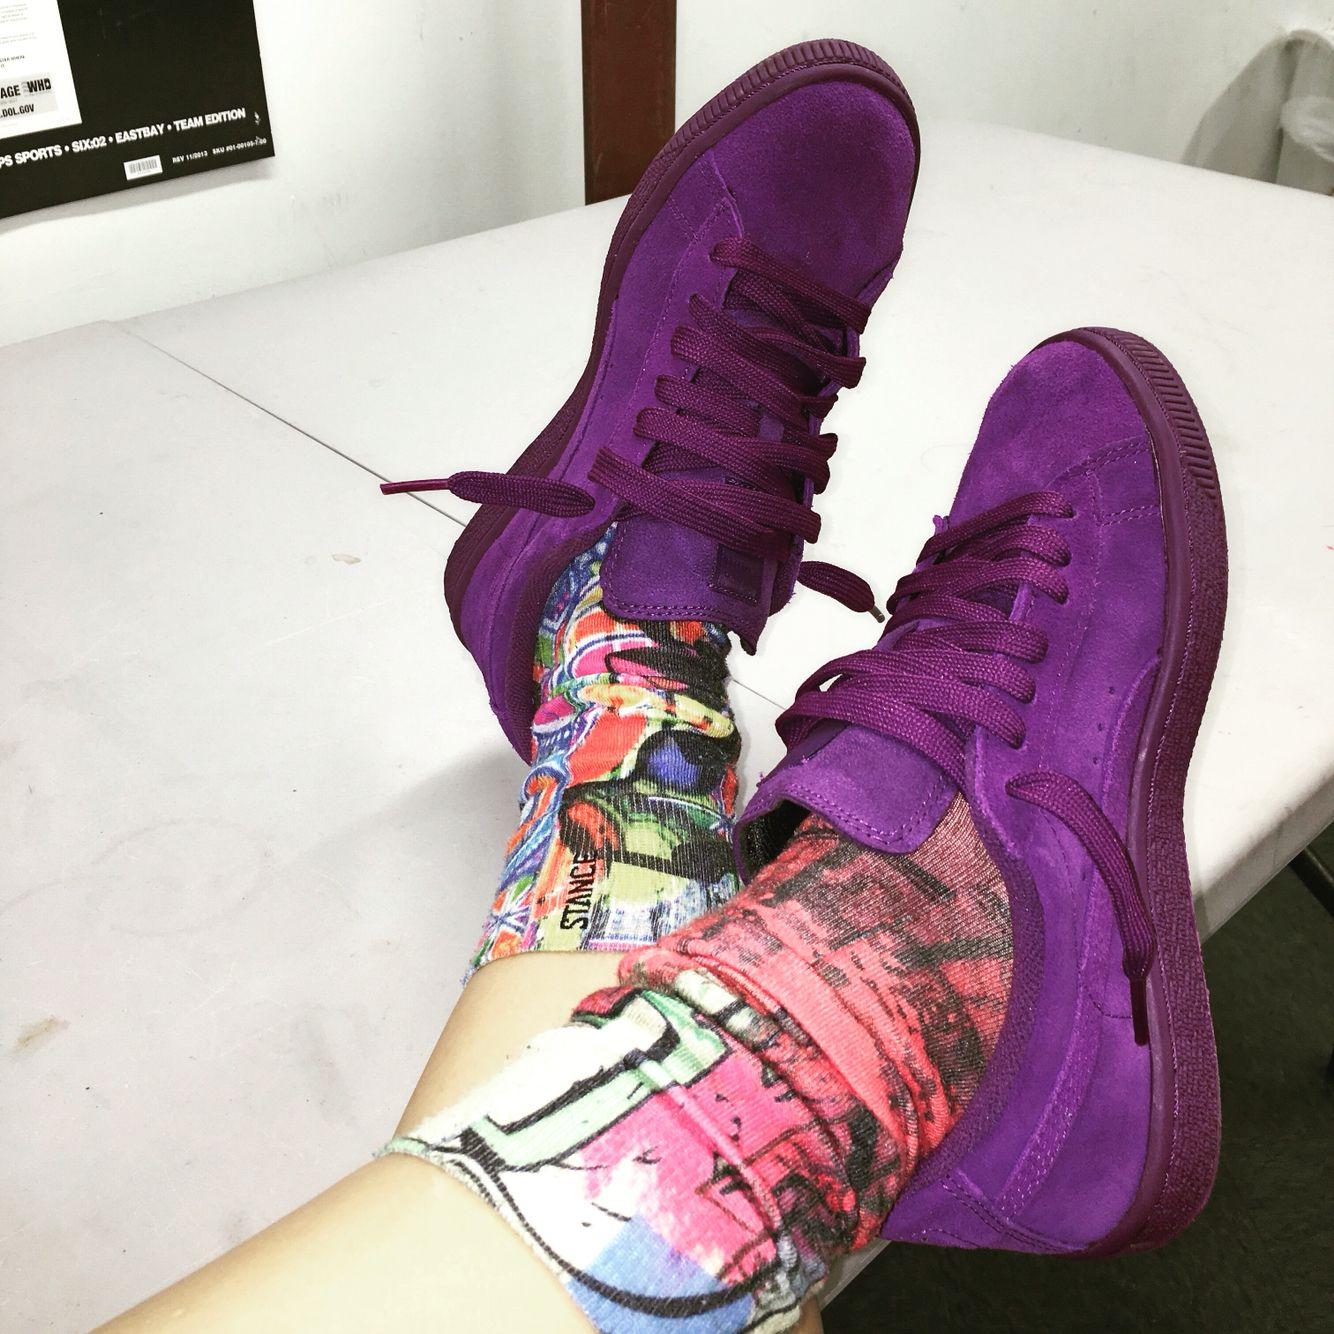 SuedeFashionOutfitKicks Puma Purple Puma Purple Shoes Shoes SuedeFashionOutfitKicks Puma SuedeFashionOutfitKicks Shoes Purple Purple Pv0y8nOmNw